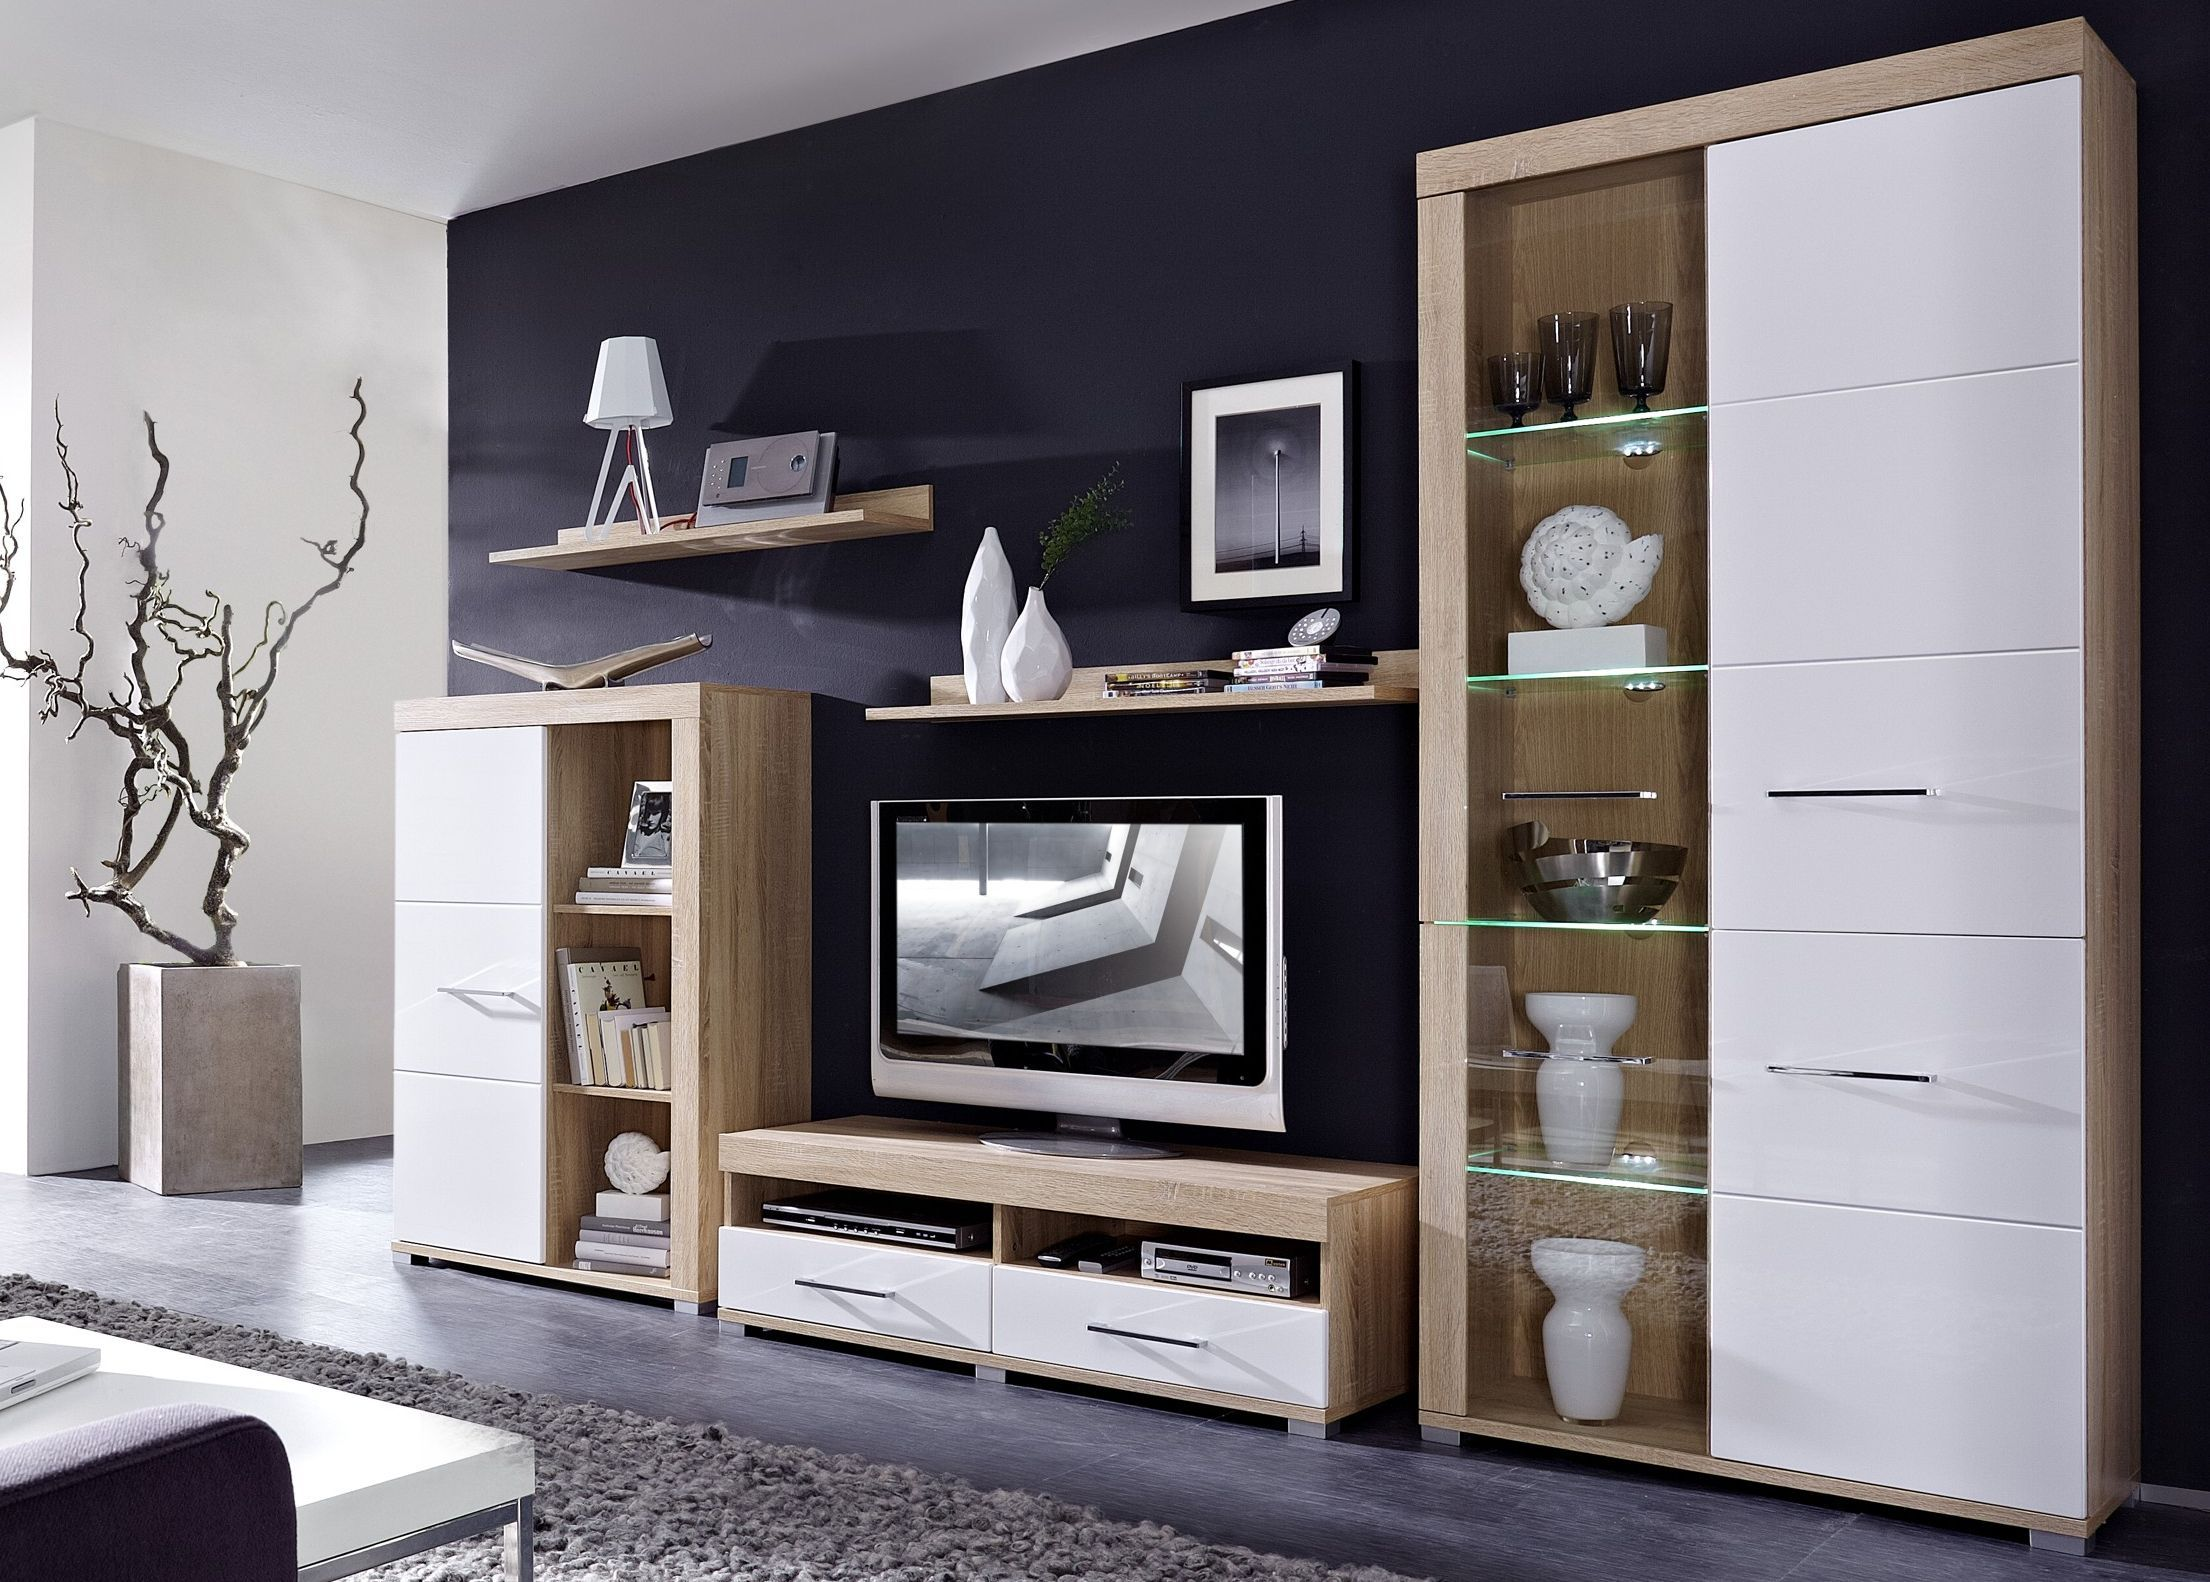 Genial Wohnwand Weiß Holz Tv Furniture Home Home Decor